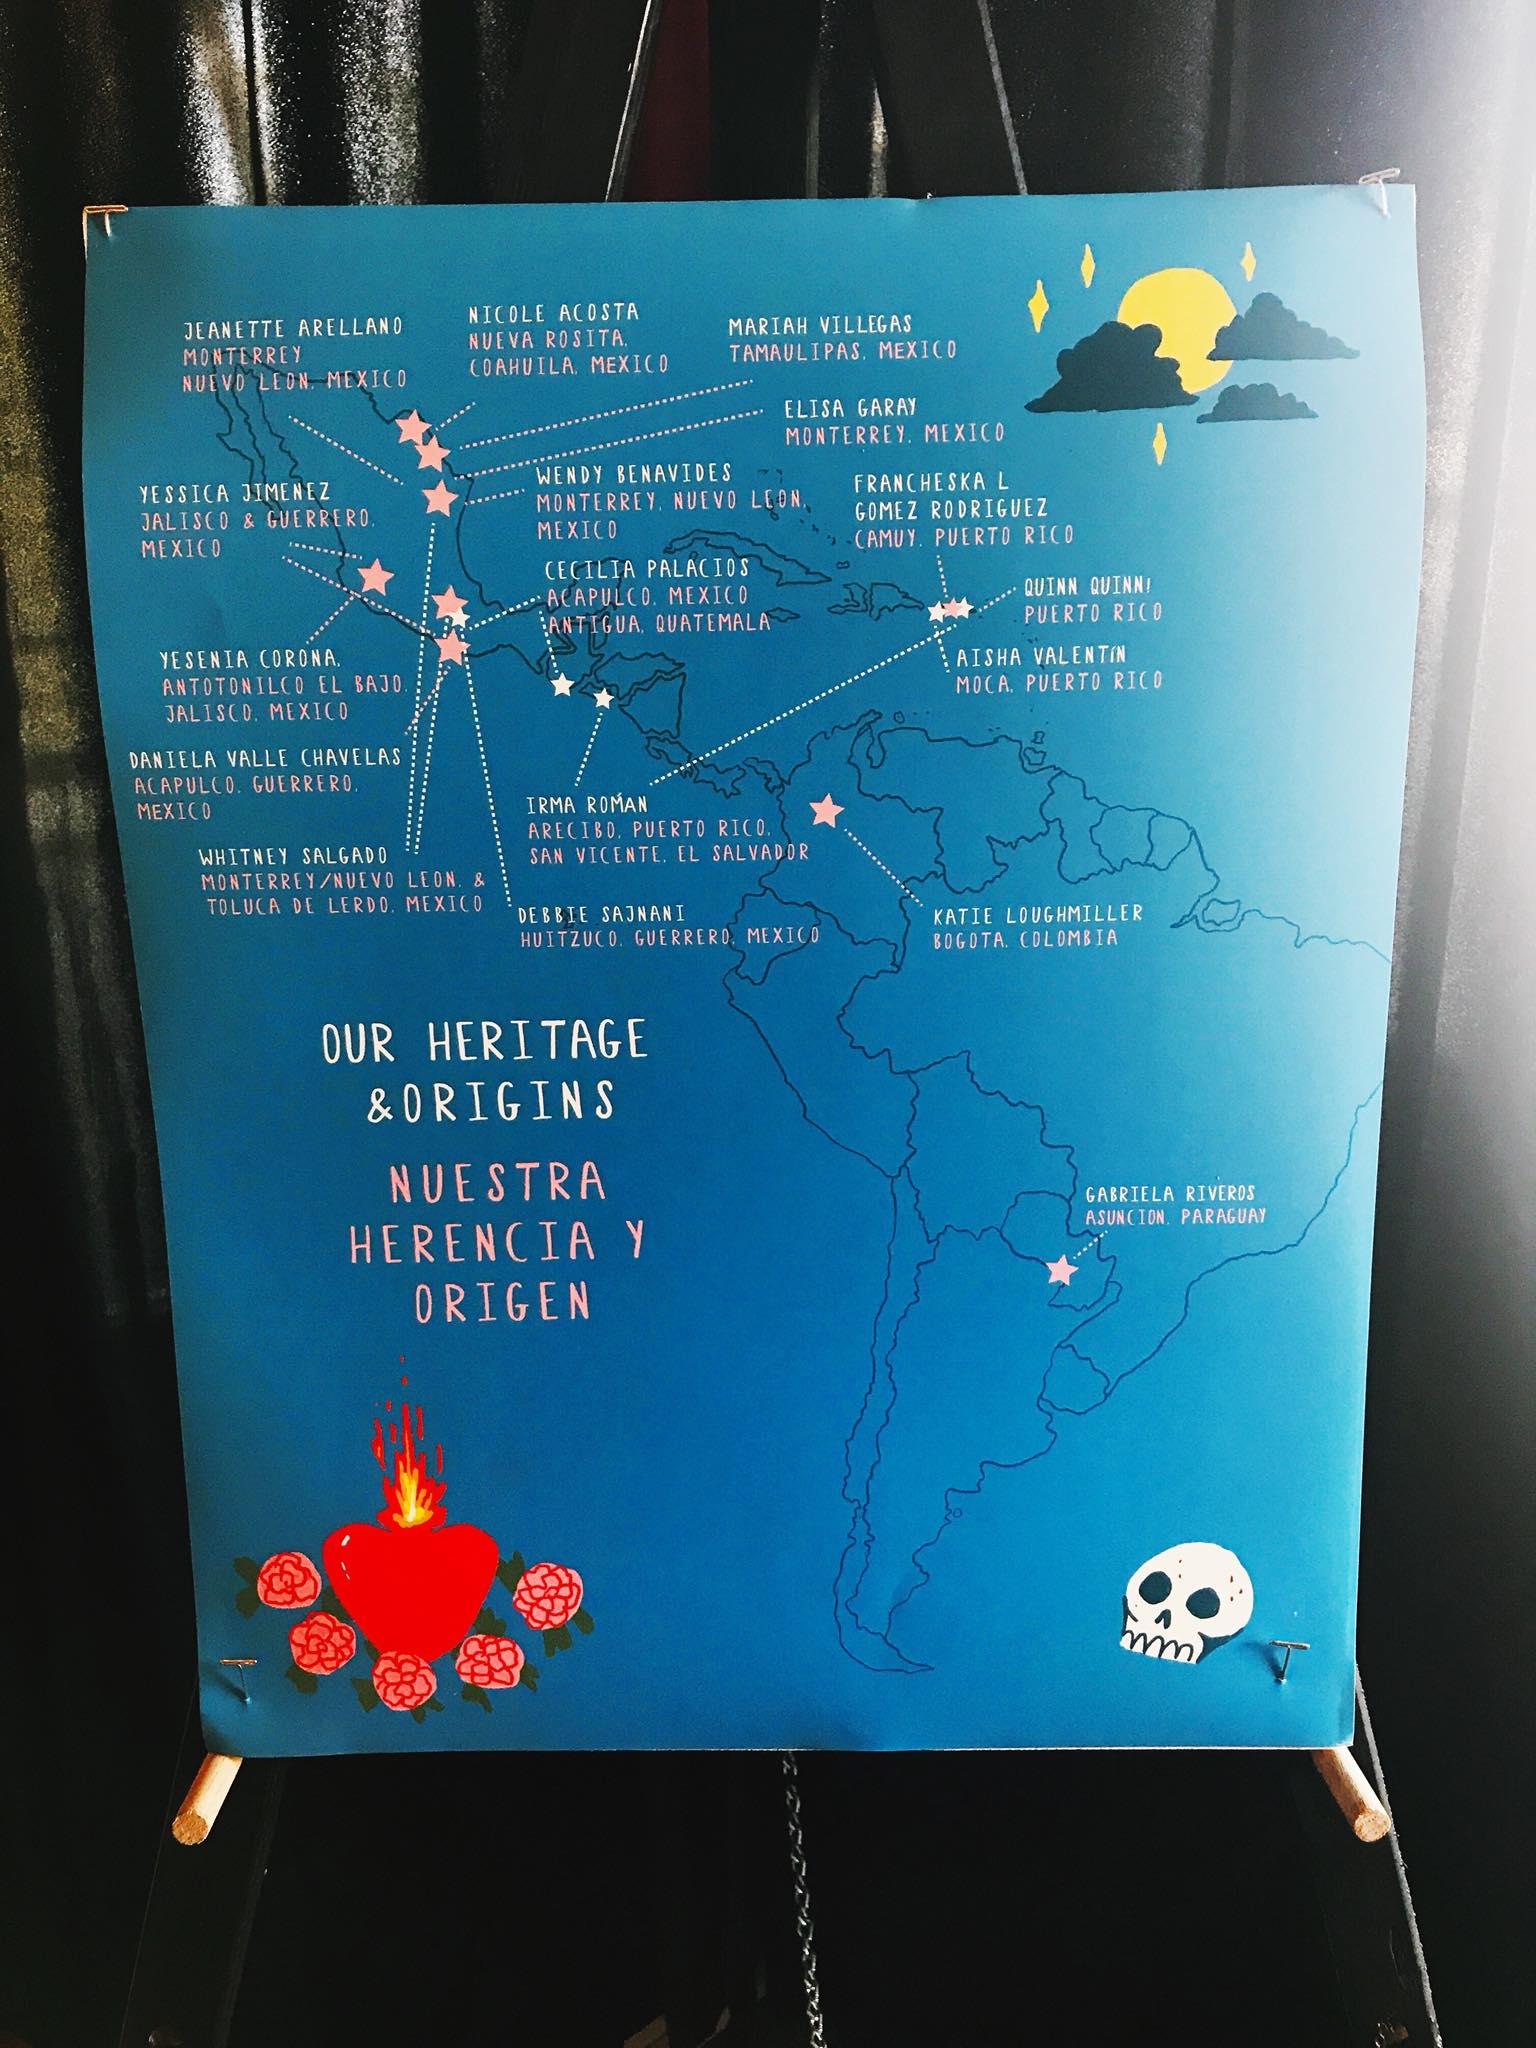 LUNA Heritage poster by Gabriela Riveros